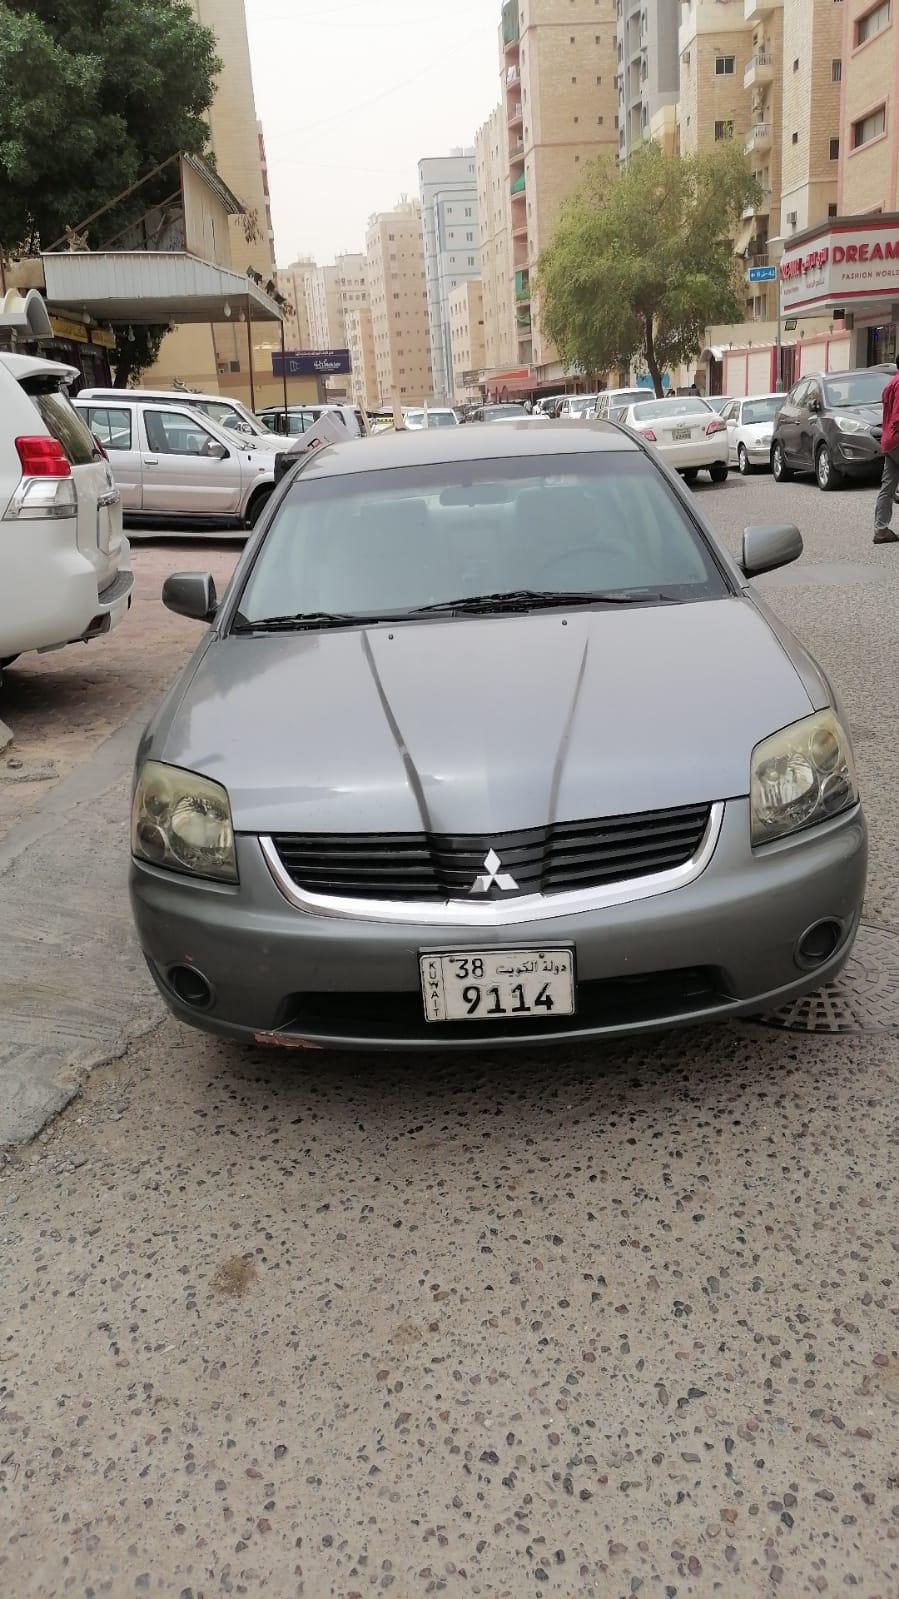 Mitsubishi Galant 2007 model - Excellent Condition